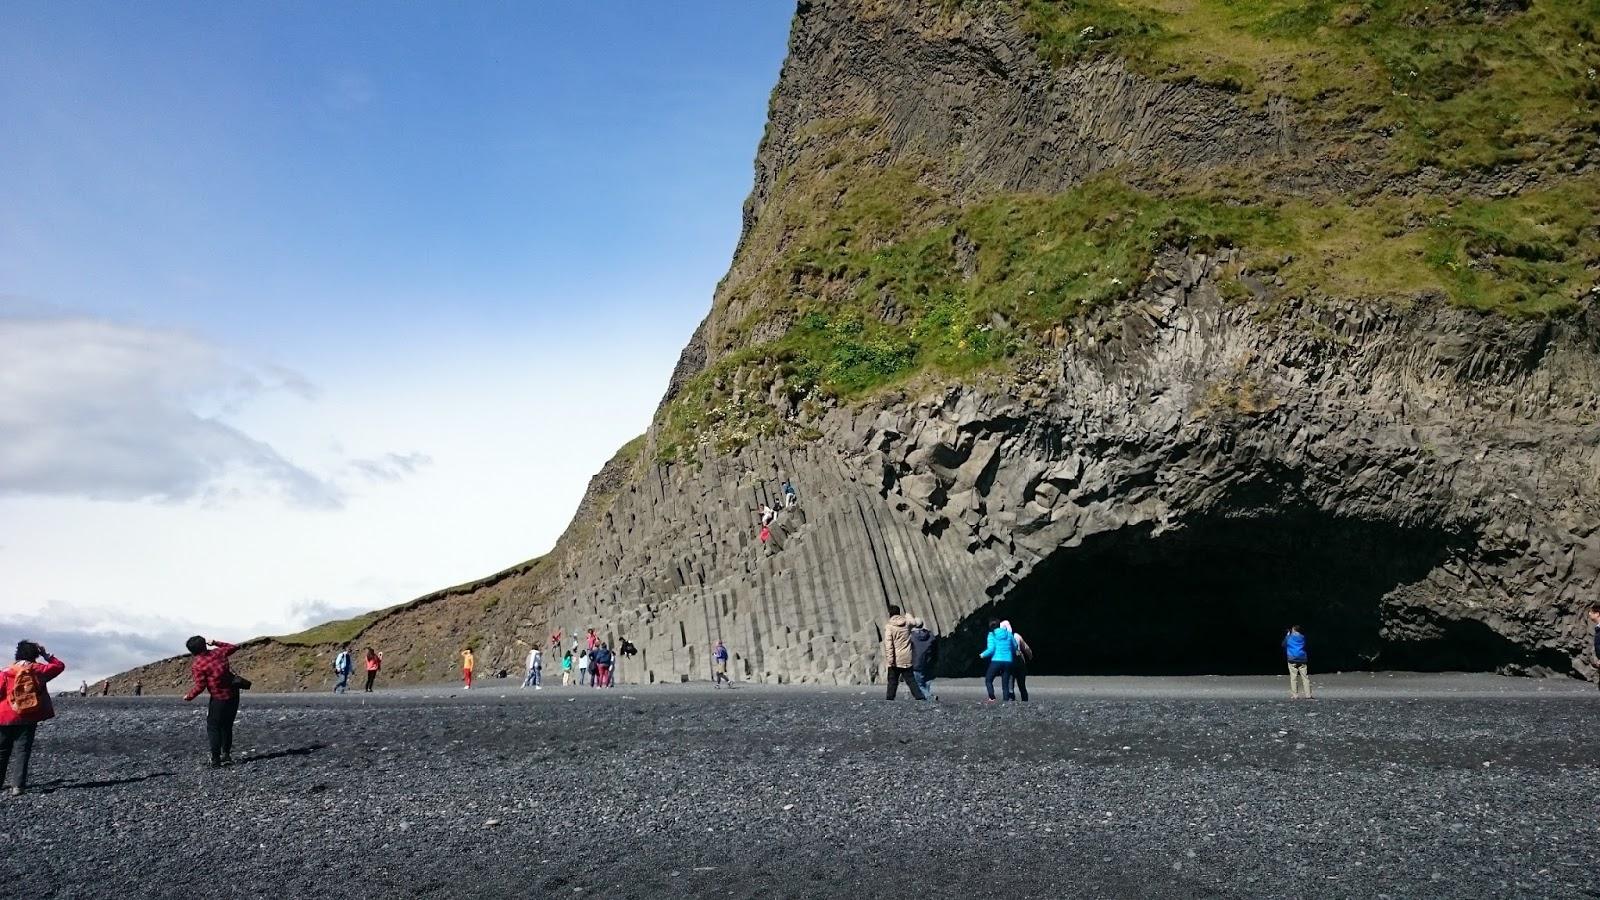 czarna plaża, Reynisfjara, islandzka plaża, Islandia, atrakcje Islandii